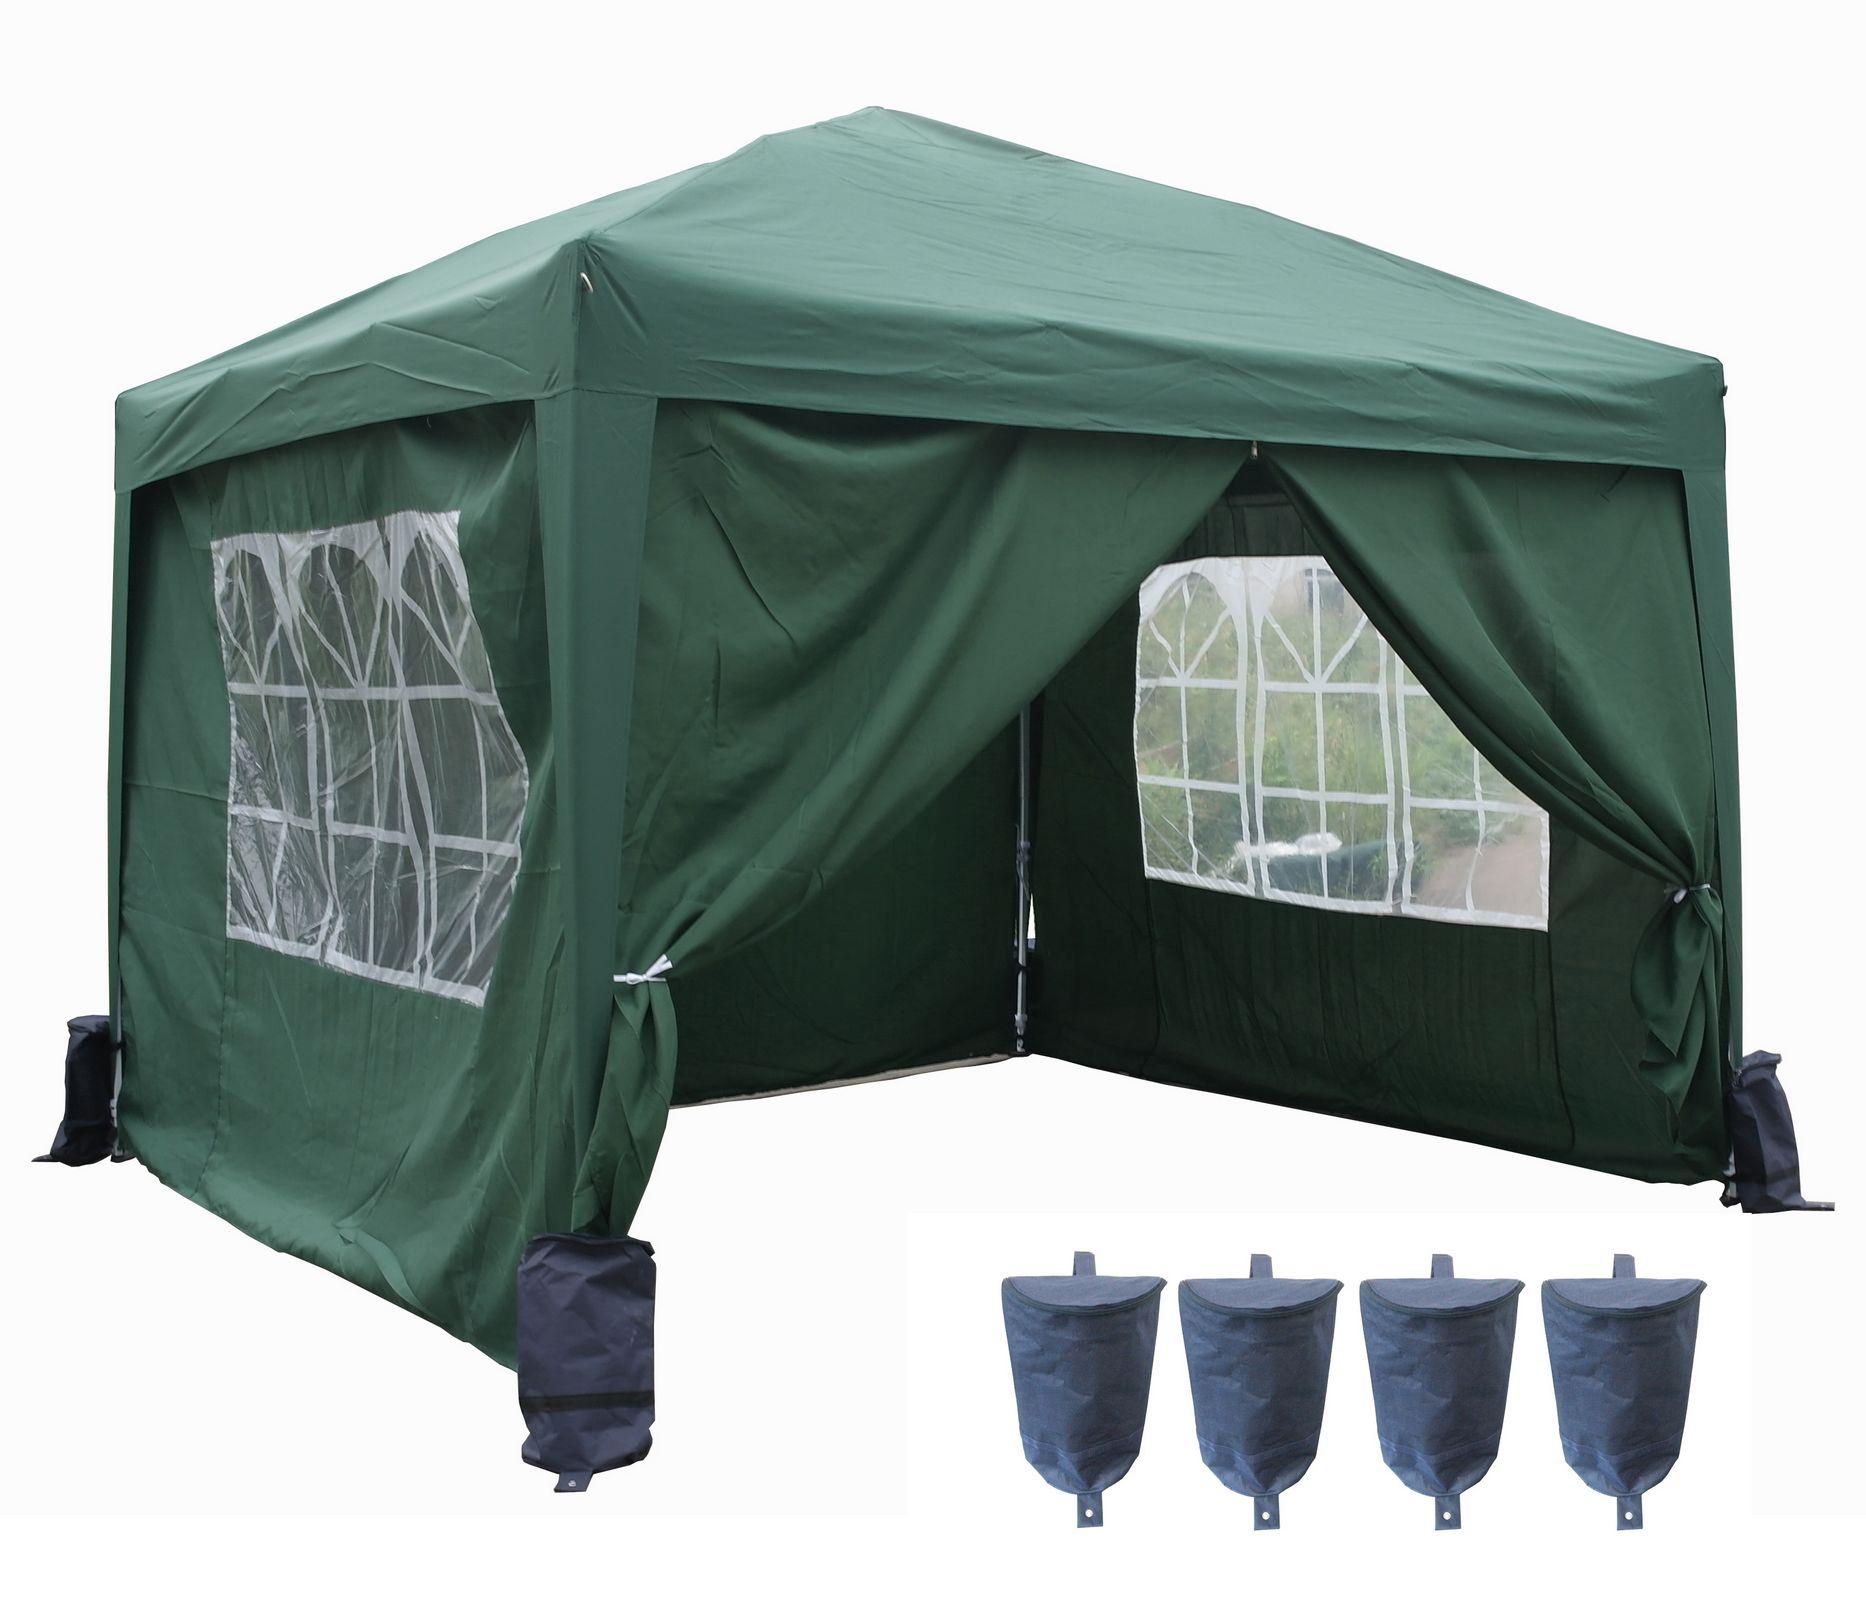 pop up pvc garden gazebo waterproof 3 x 3m folding party. Black Bedroom Furniture Sets. Home Design Ideas